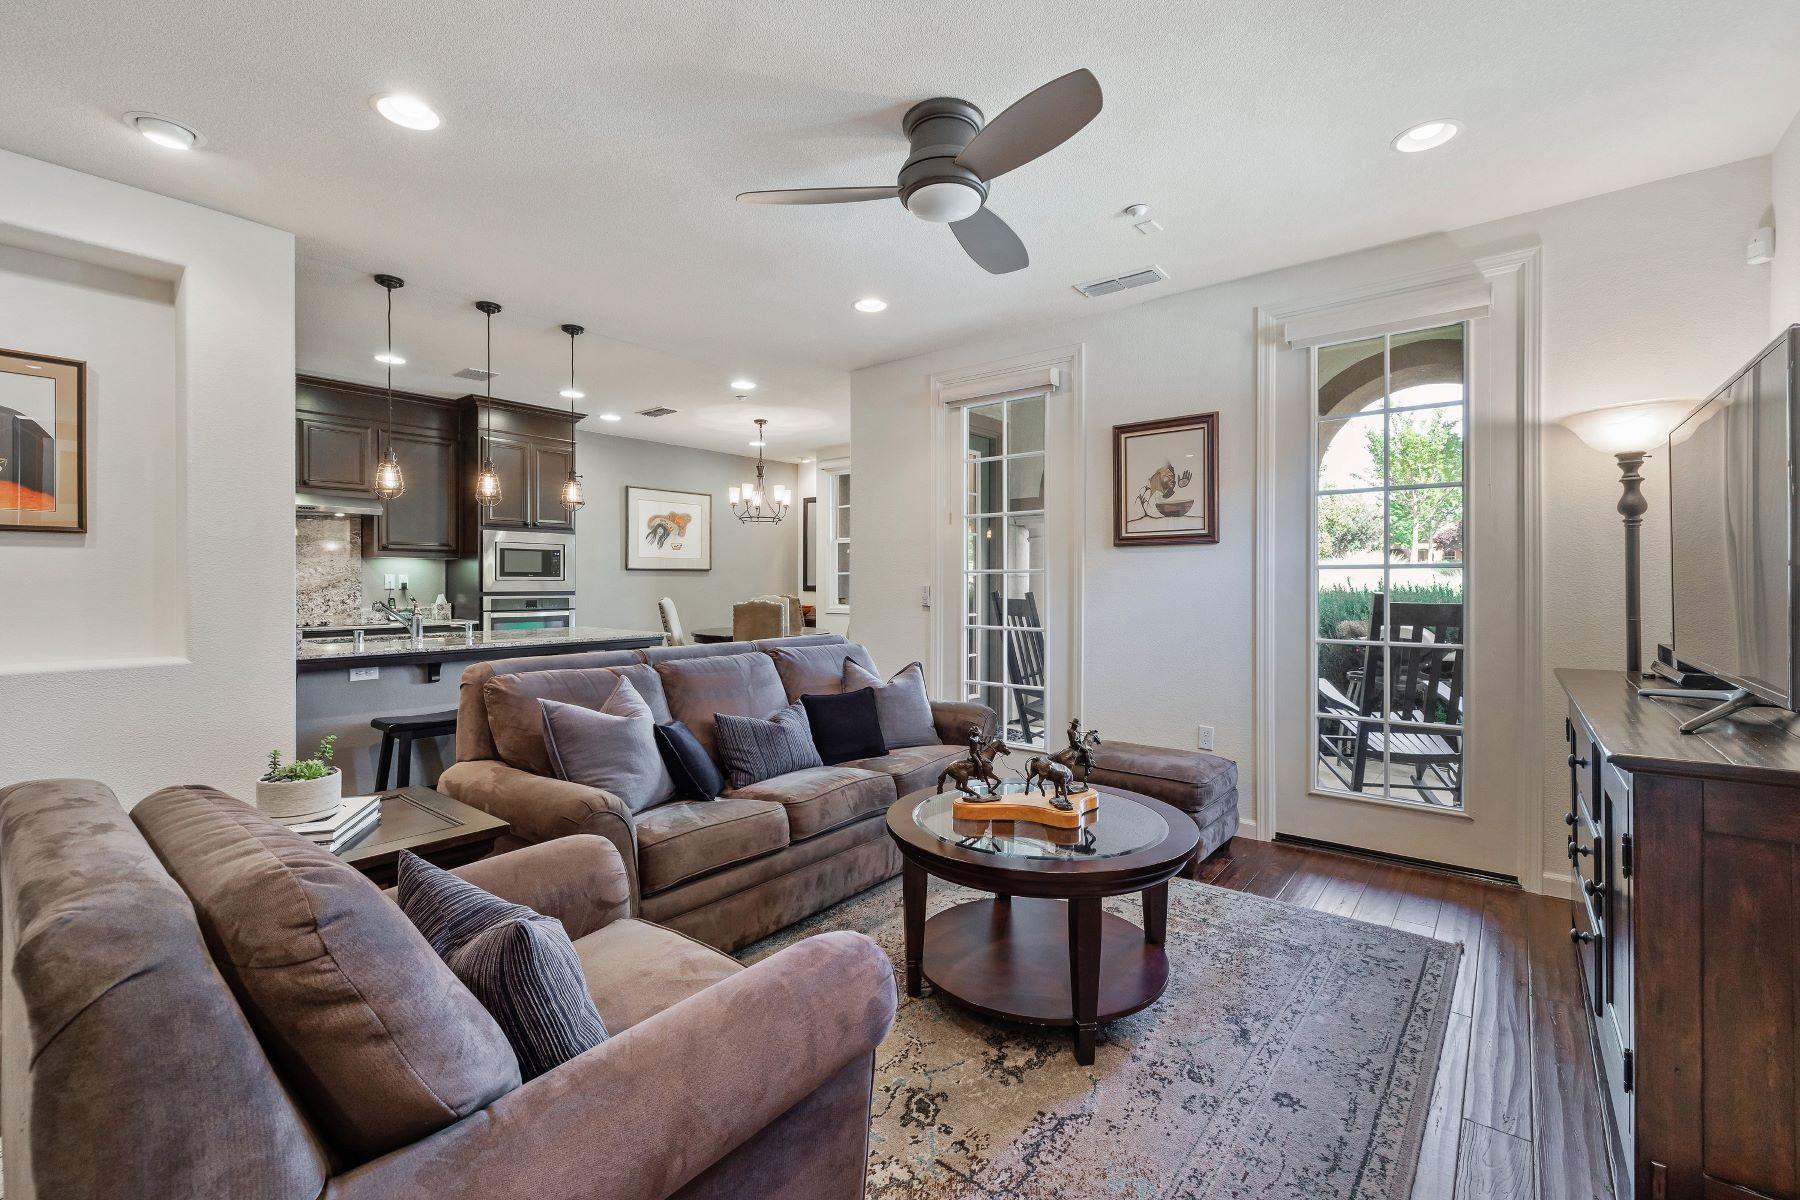 Condominiums for Sale at Rare Ground Level Single Story 3643 Aviano Way Dublin, California 94568 United States